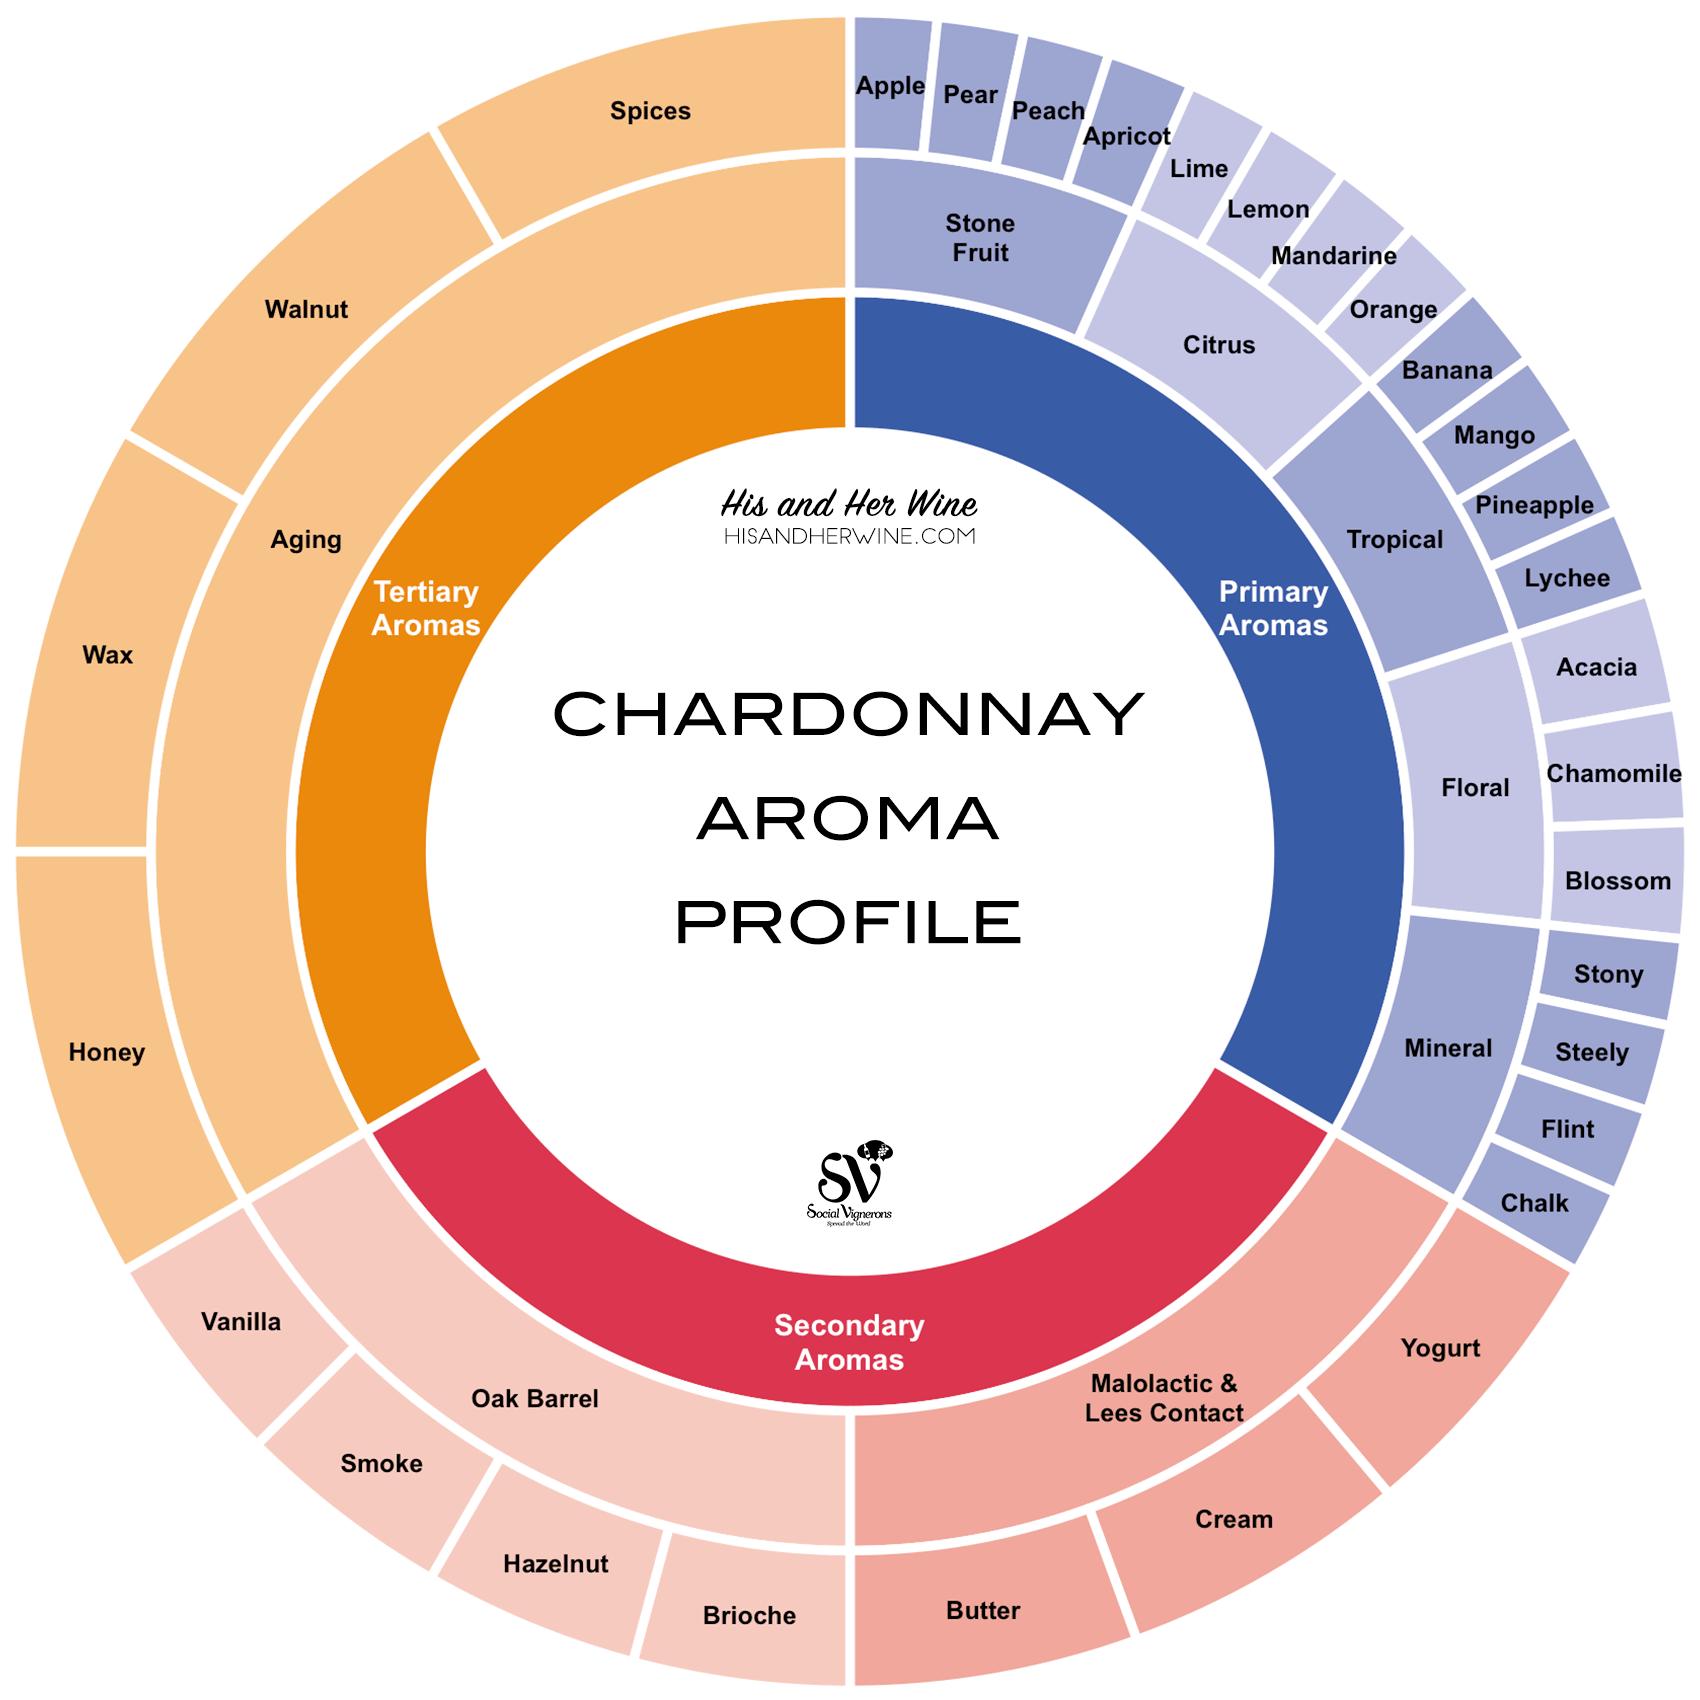 Chardonnay Aroma Profile Chart #wine #winetasting #wineeducation